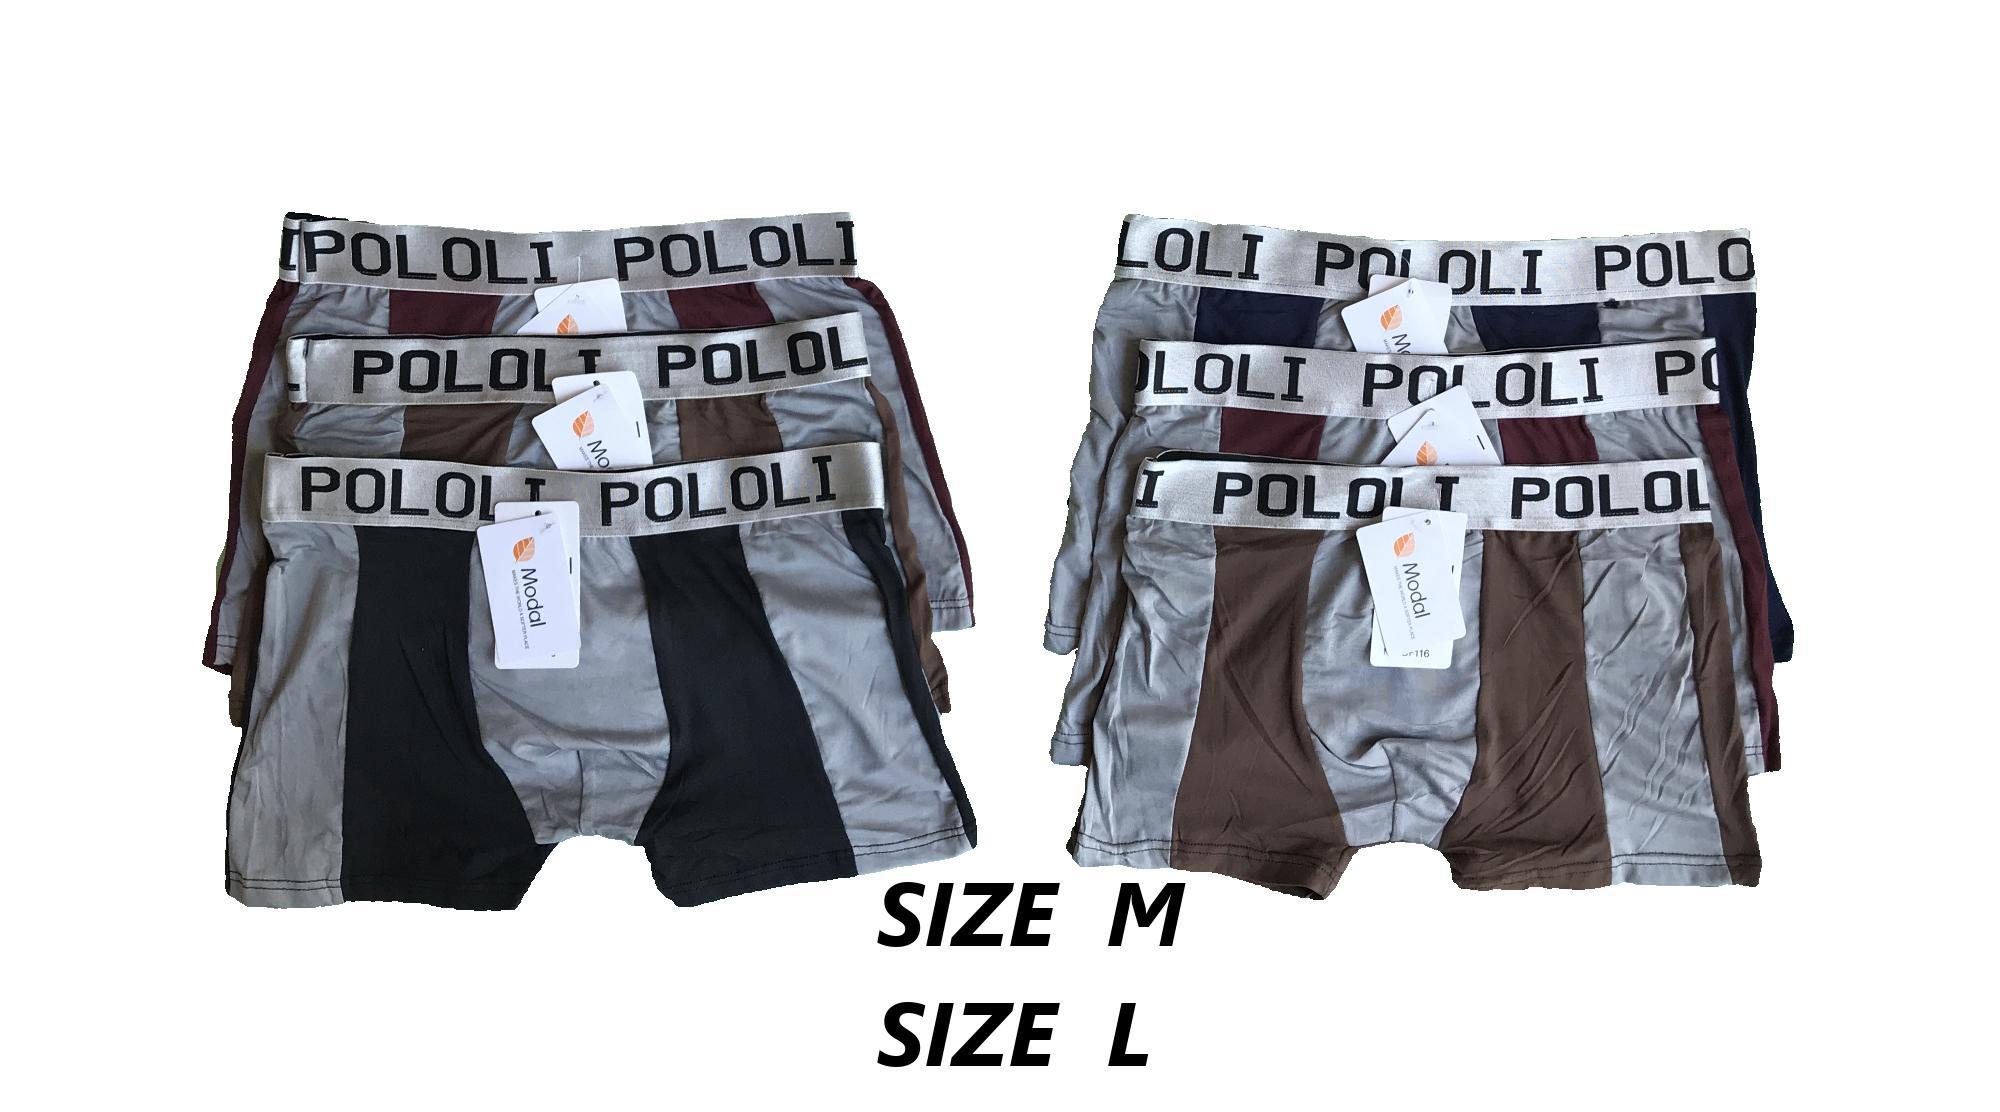 PADIe - 6 PCS Celana Dalam Pria model Boxer Multi Colour /sempak/underwear Laki-laki